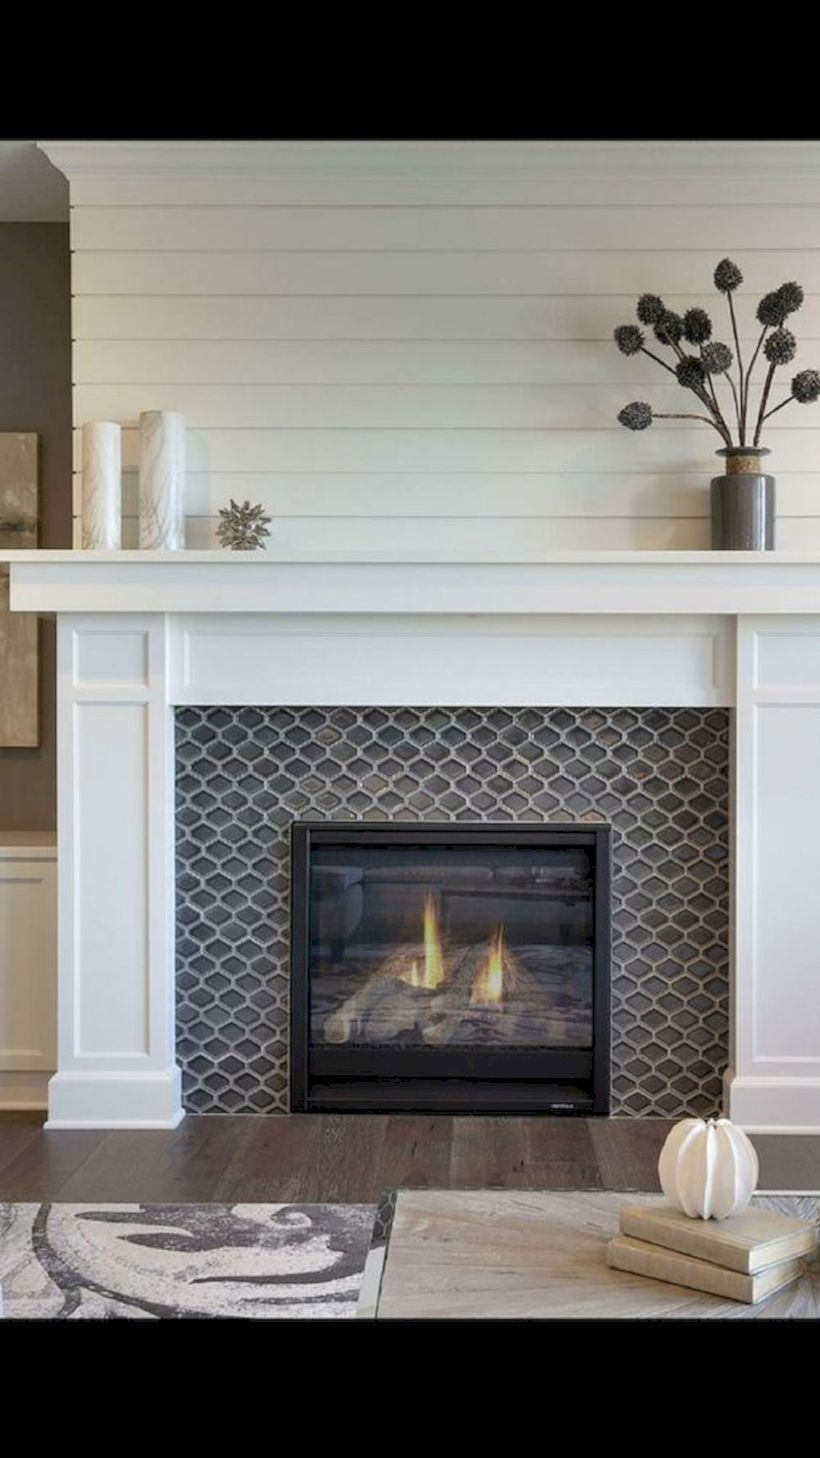 47 Cozy Fireplaces Ideas For Home Cozy Darkfireplacetileideas